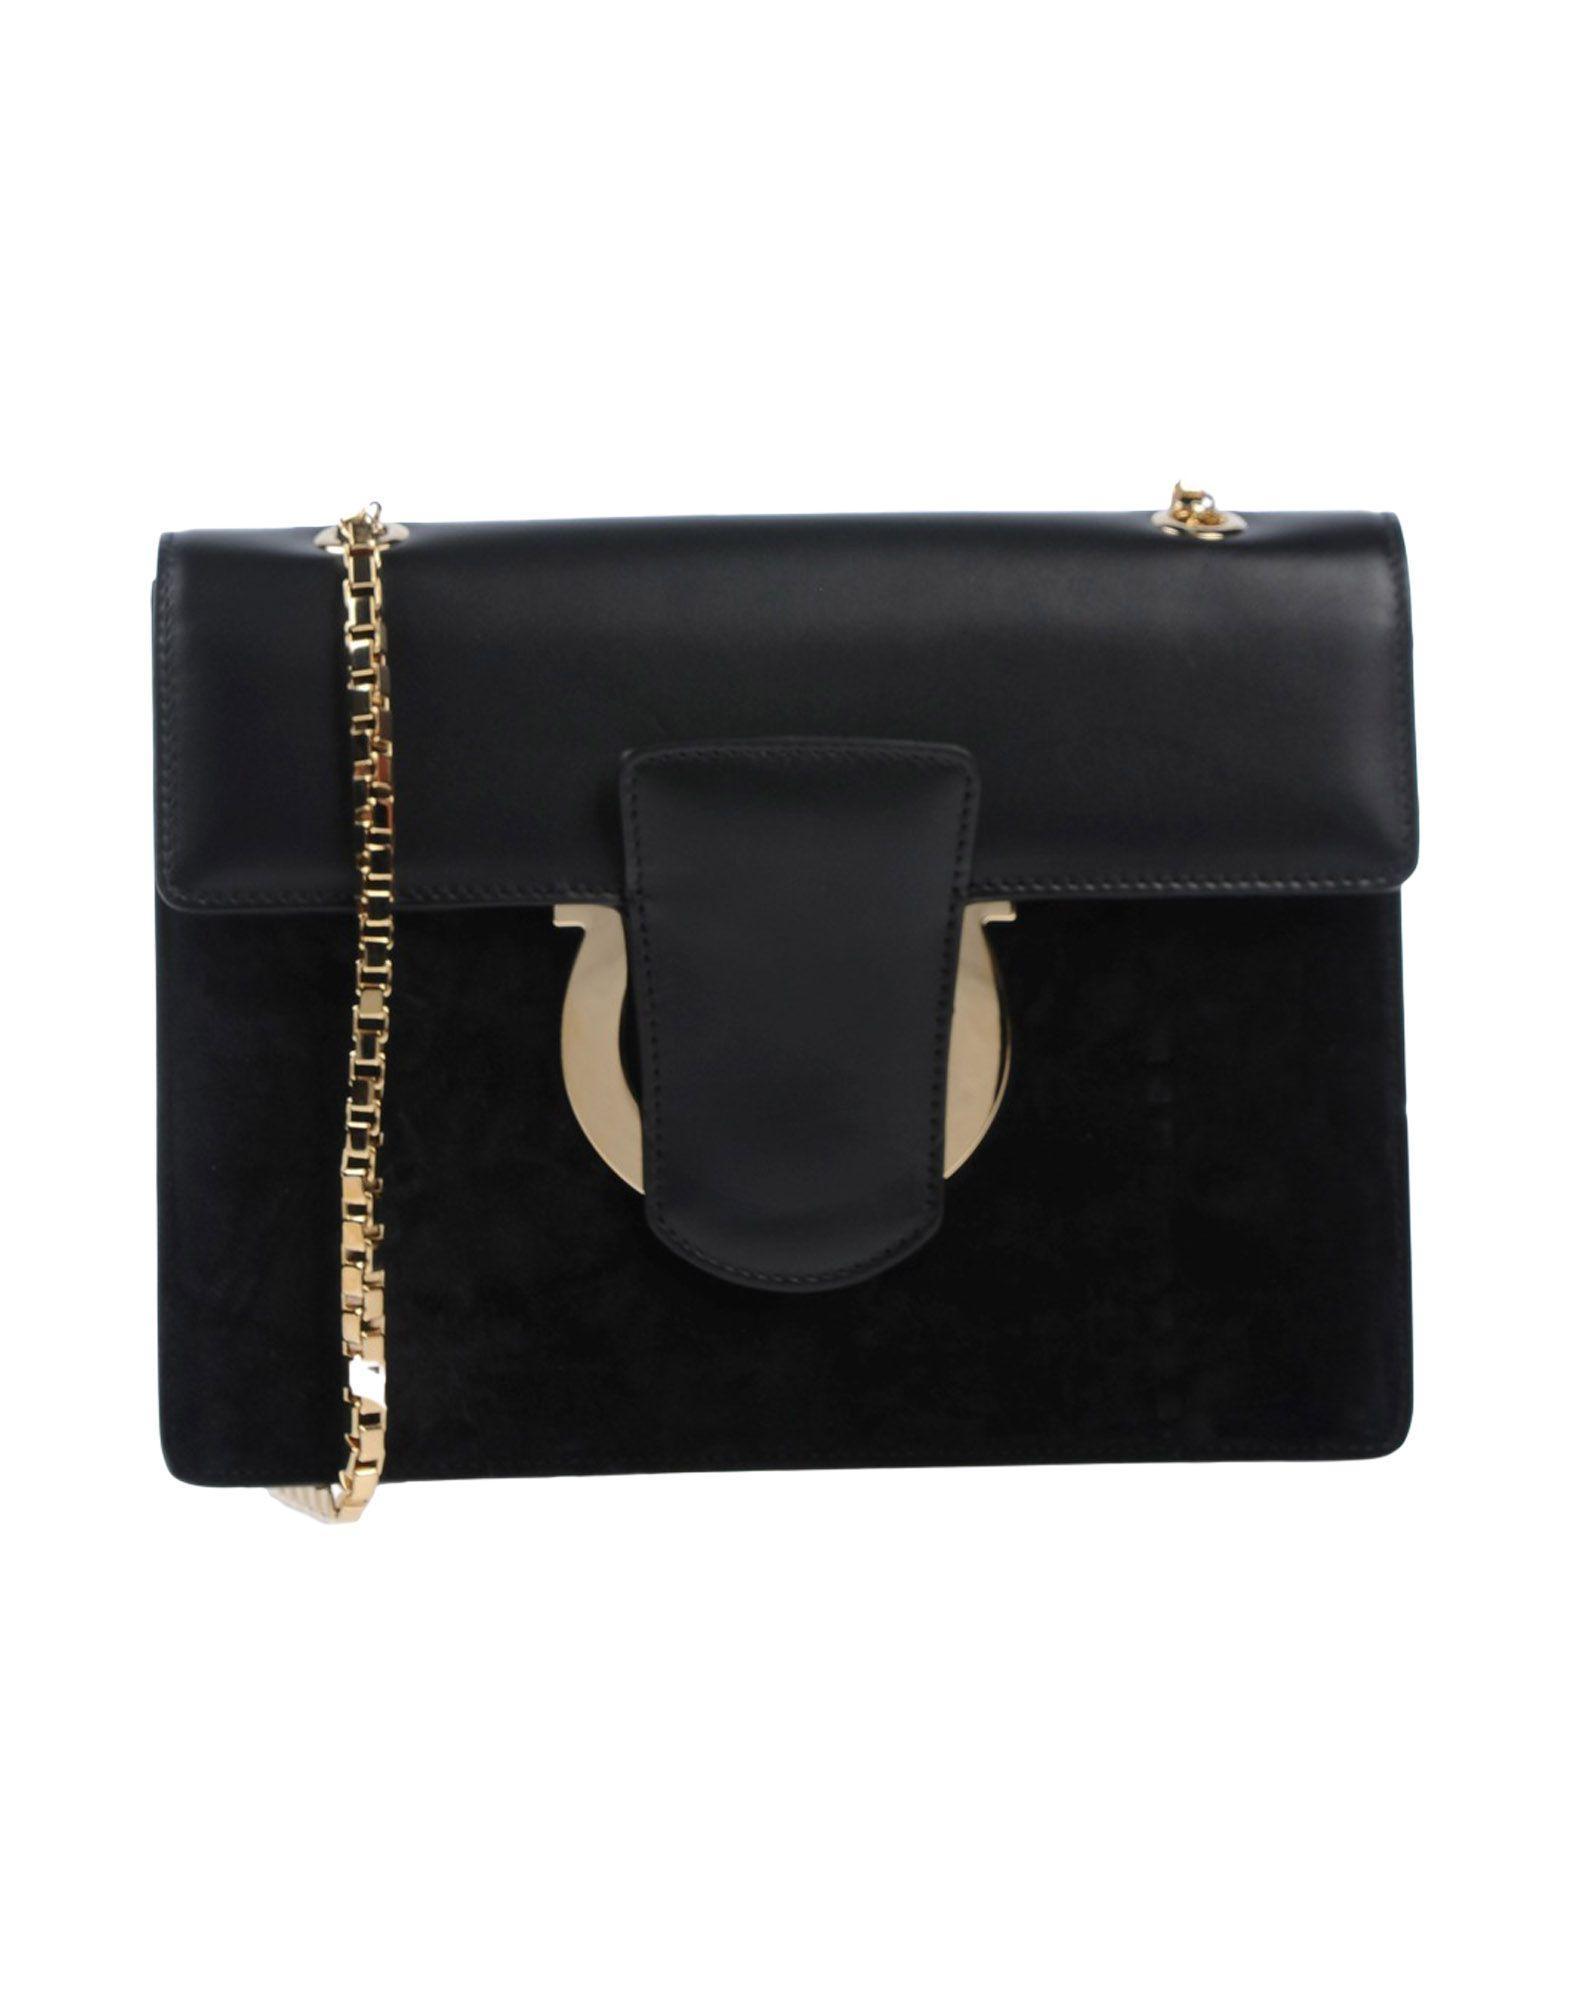 Salvatore Ferragamo Cross-body Bags In Black